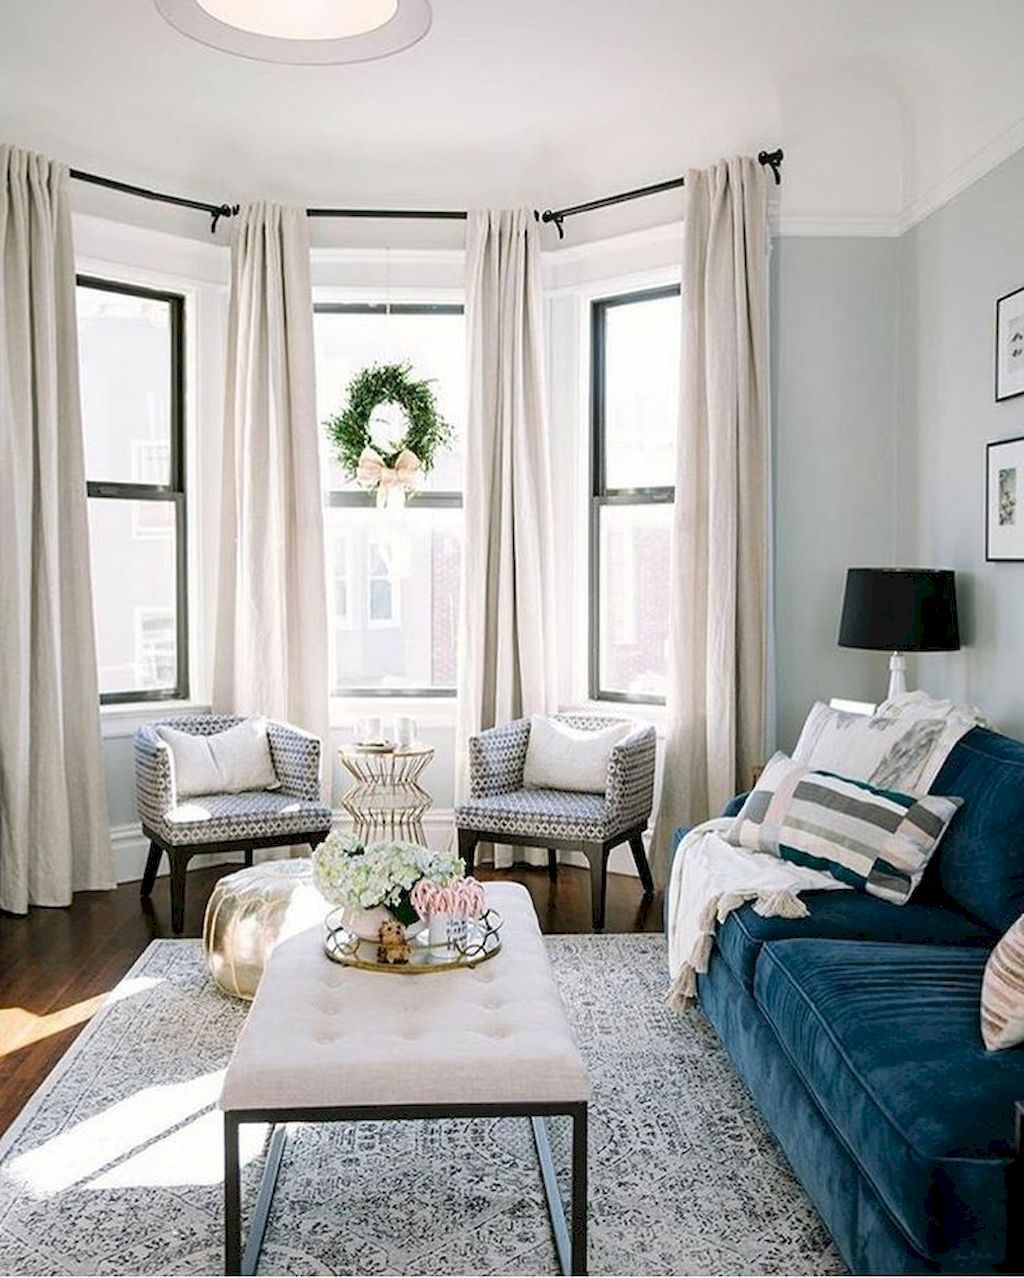 11 Beautiful Rug for Farmhouse Living Room Decorating ... on Farmhouse Living Room Curtain Ideas  id=46805